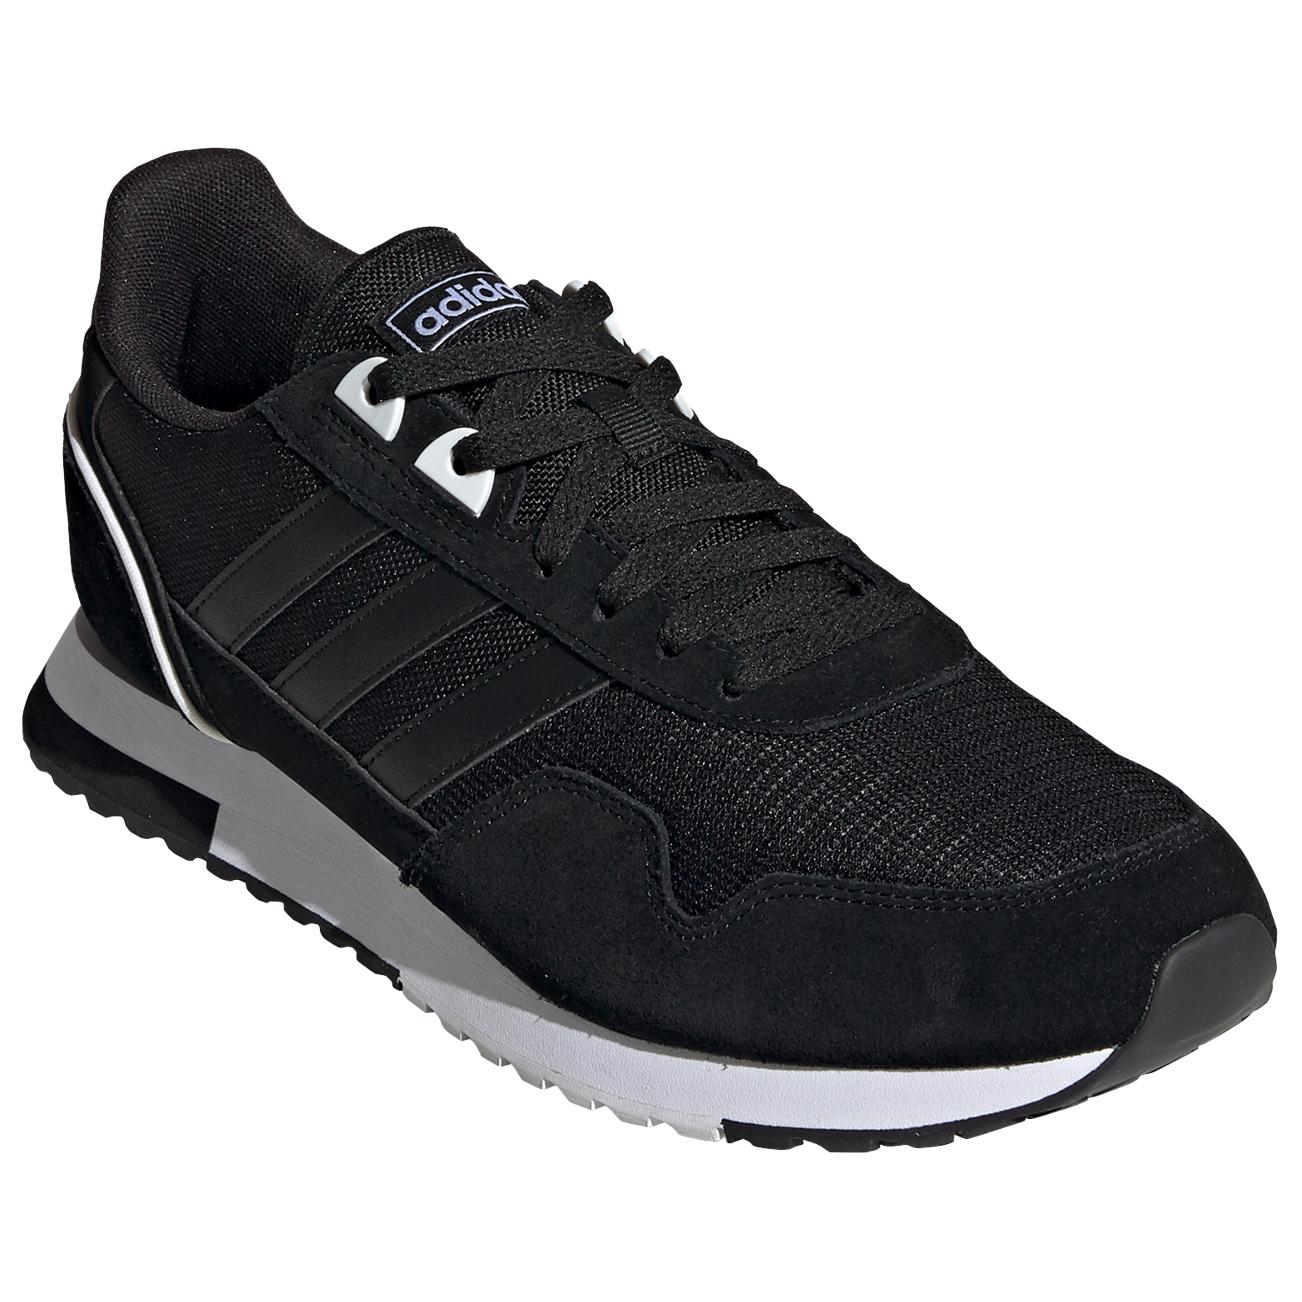 adidas - 8K 2020 - Sneakers - Chalk White / Scarlet / Legend Ink | 6,5 (UK)